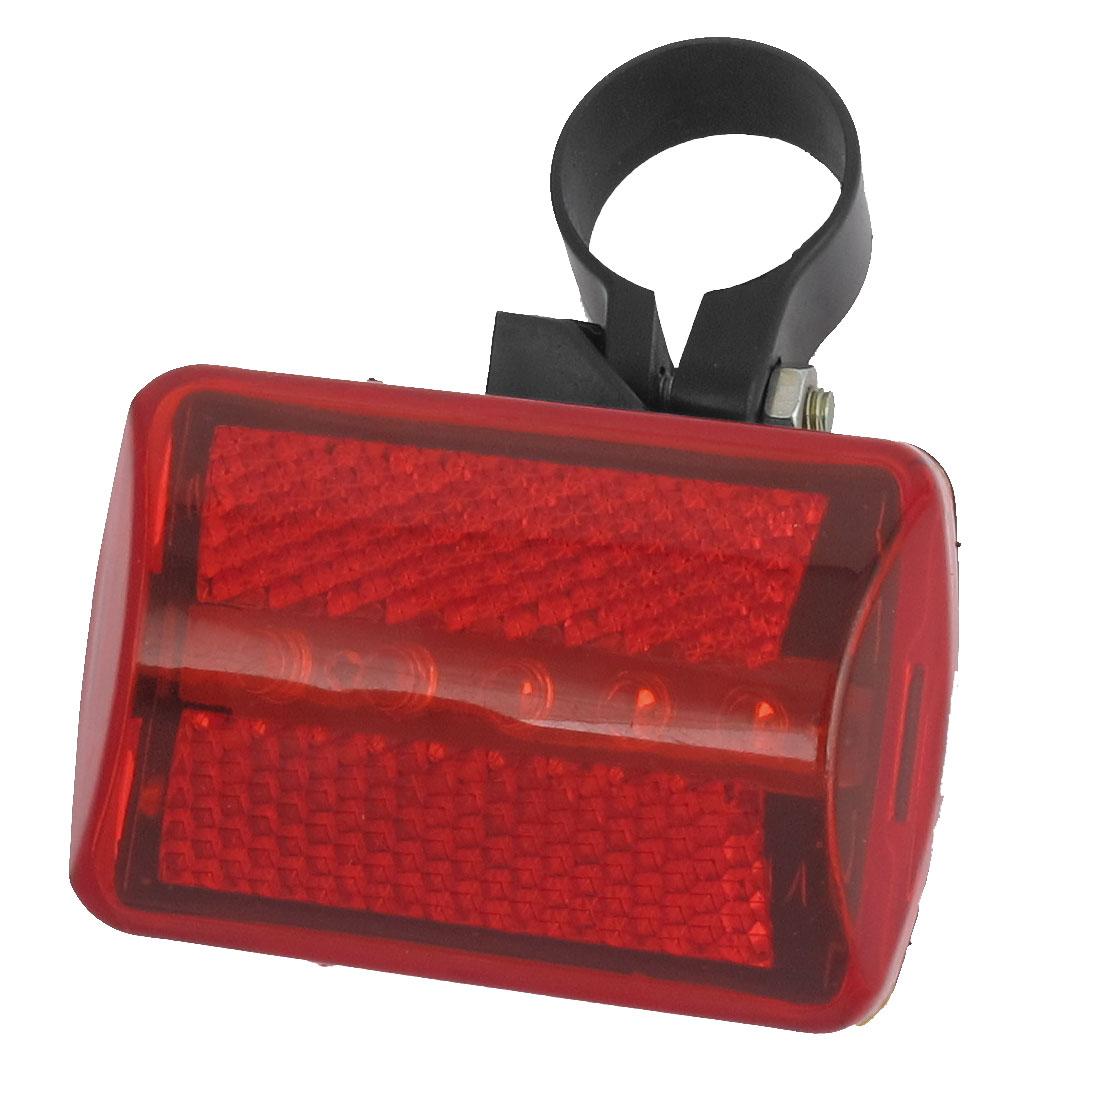 Plastic Shell Bike Backpack 6 Modes Red 5 LED Bulbs Safety Rear Light Lamp